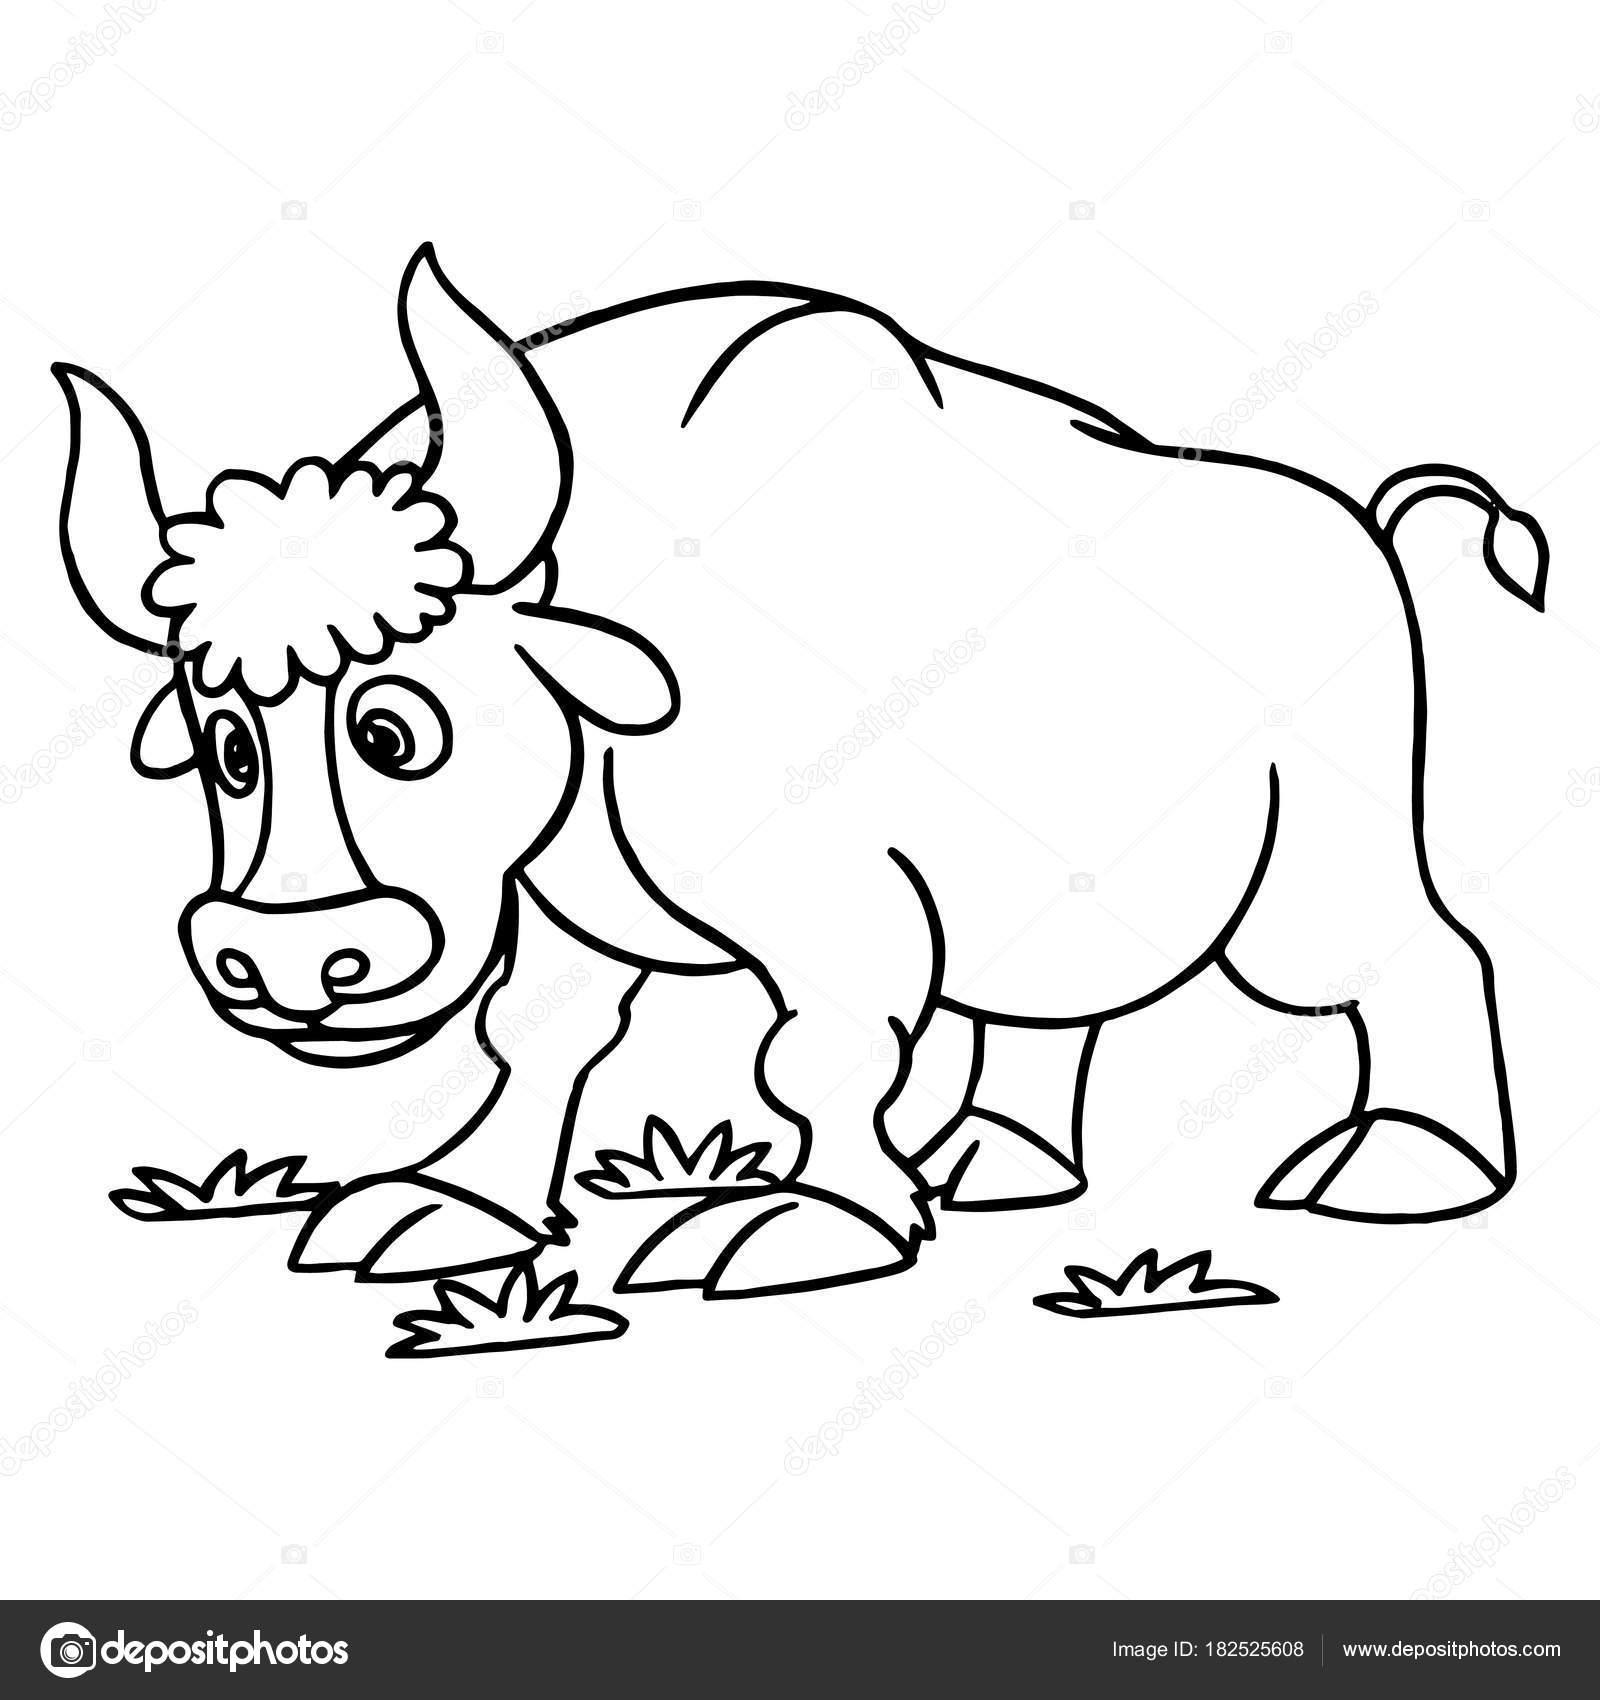 Impresiones Toro Dibujos Animados Sobre Fondo Blanco Para